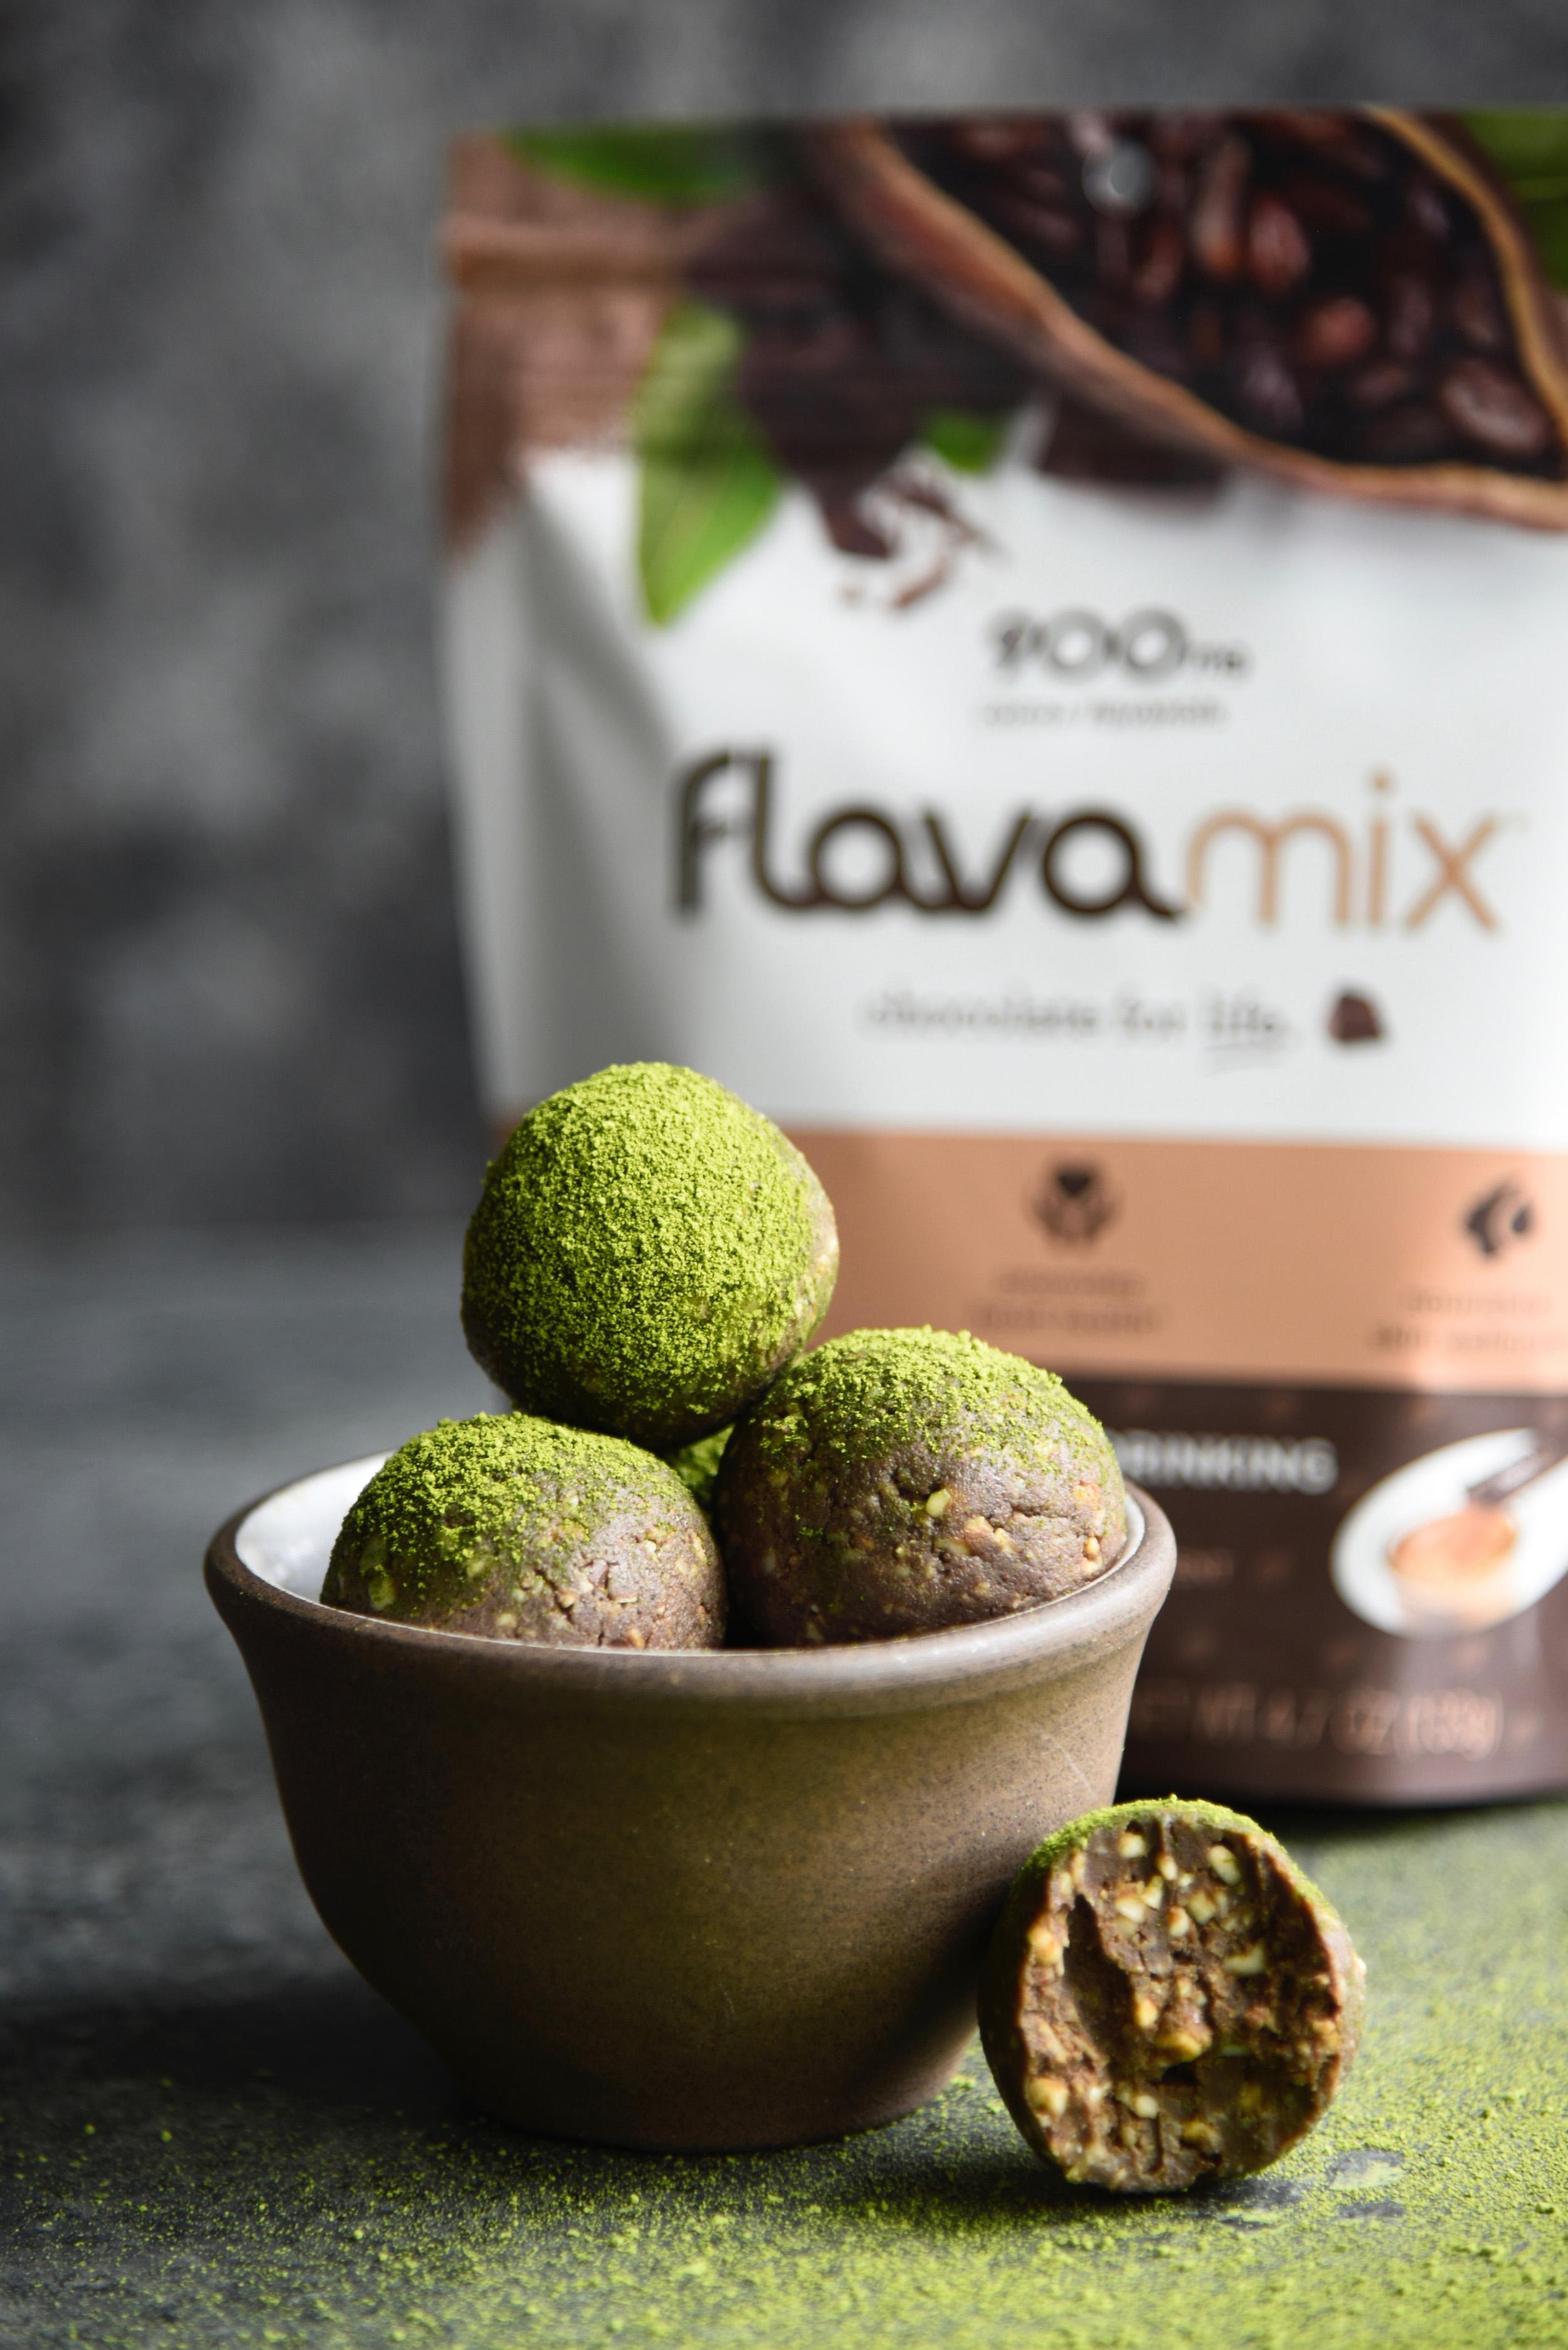 Chocolate Matcha Energy Bites with FlavaMix Unsweetened Drinking Chocolate, 900mg Cocoa Flavanols